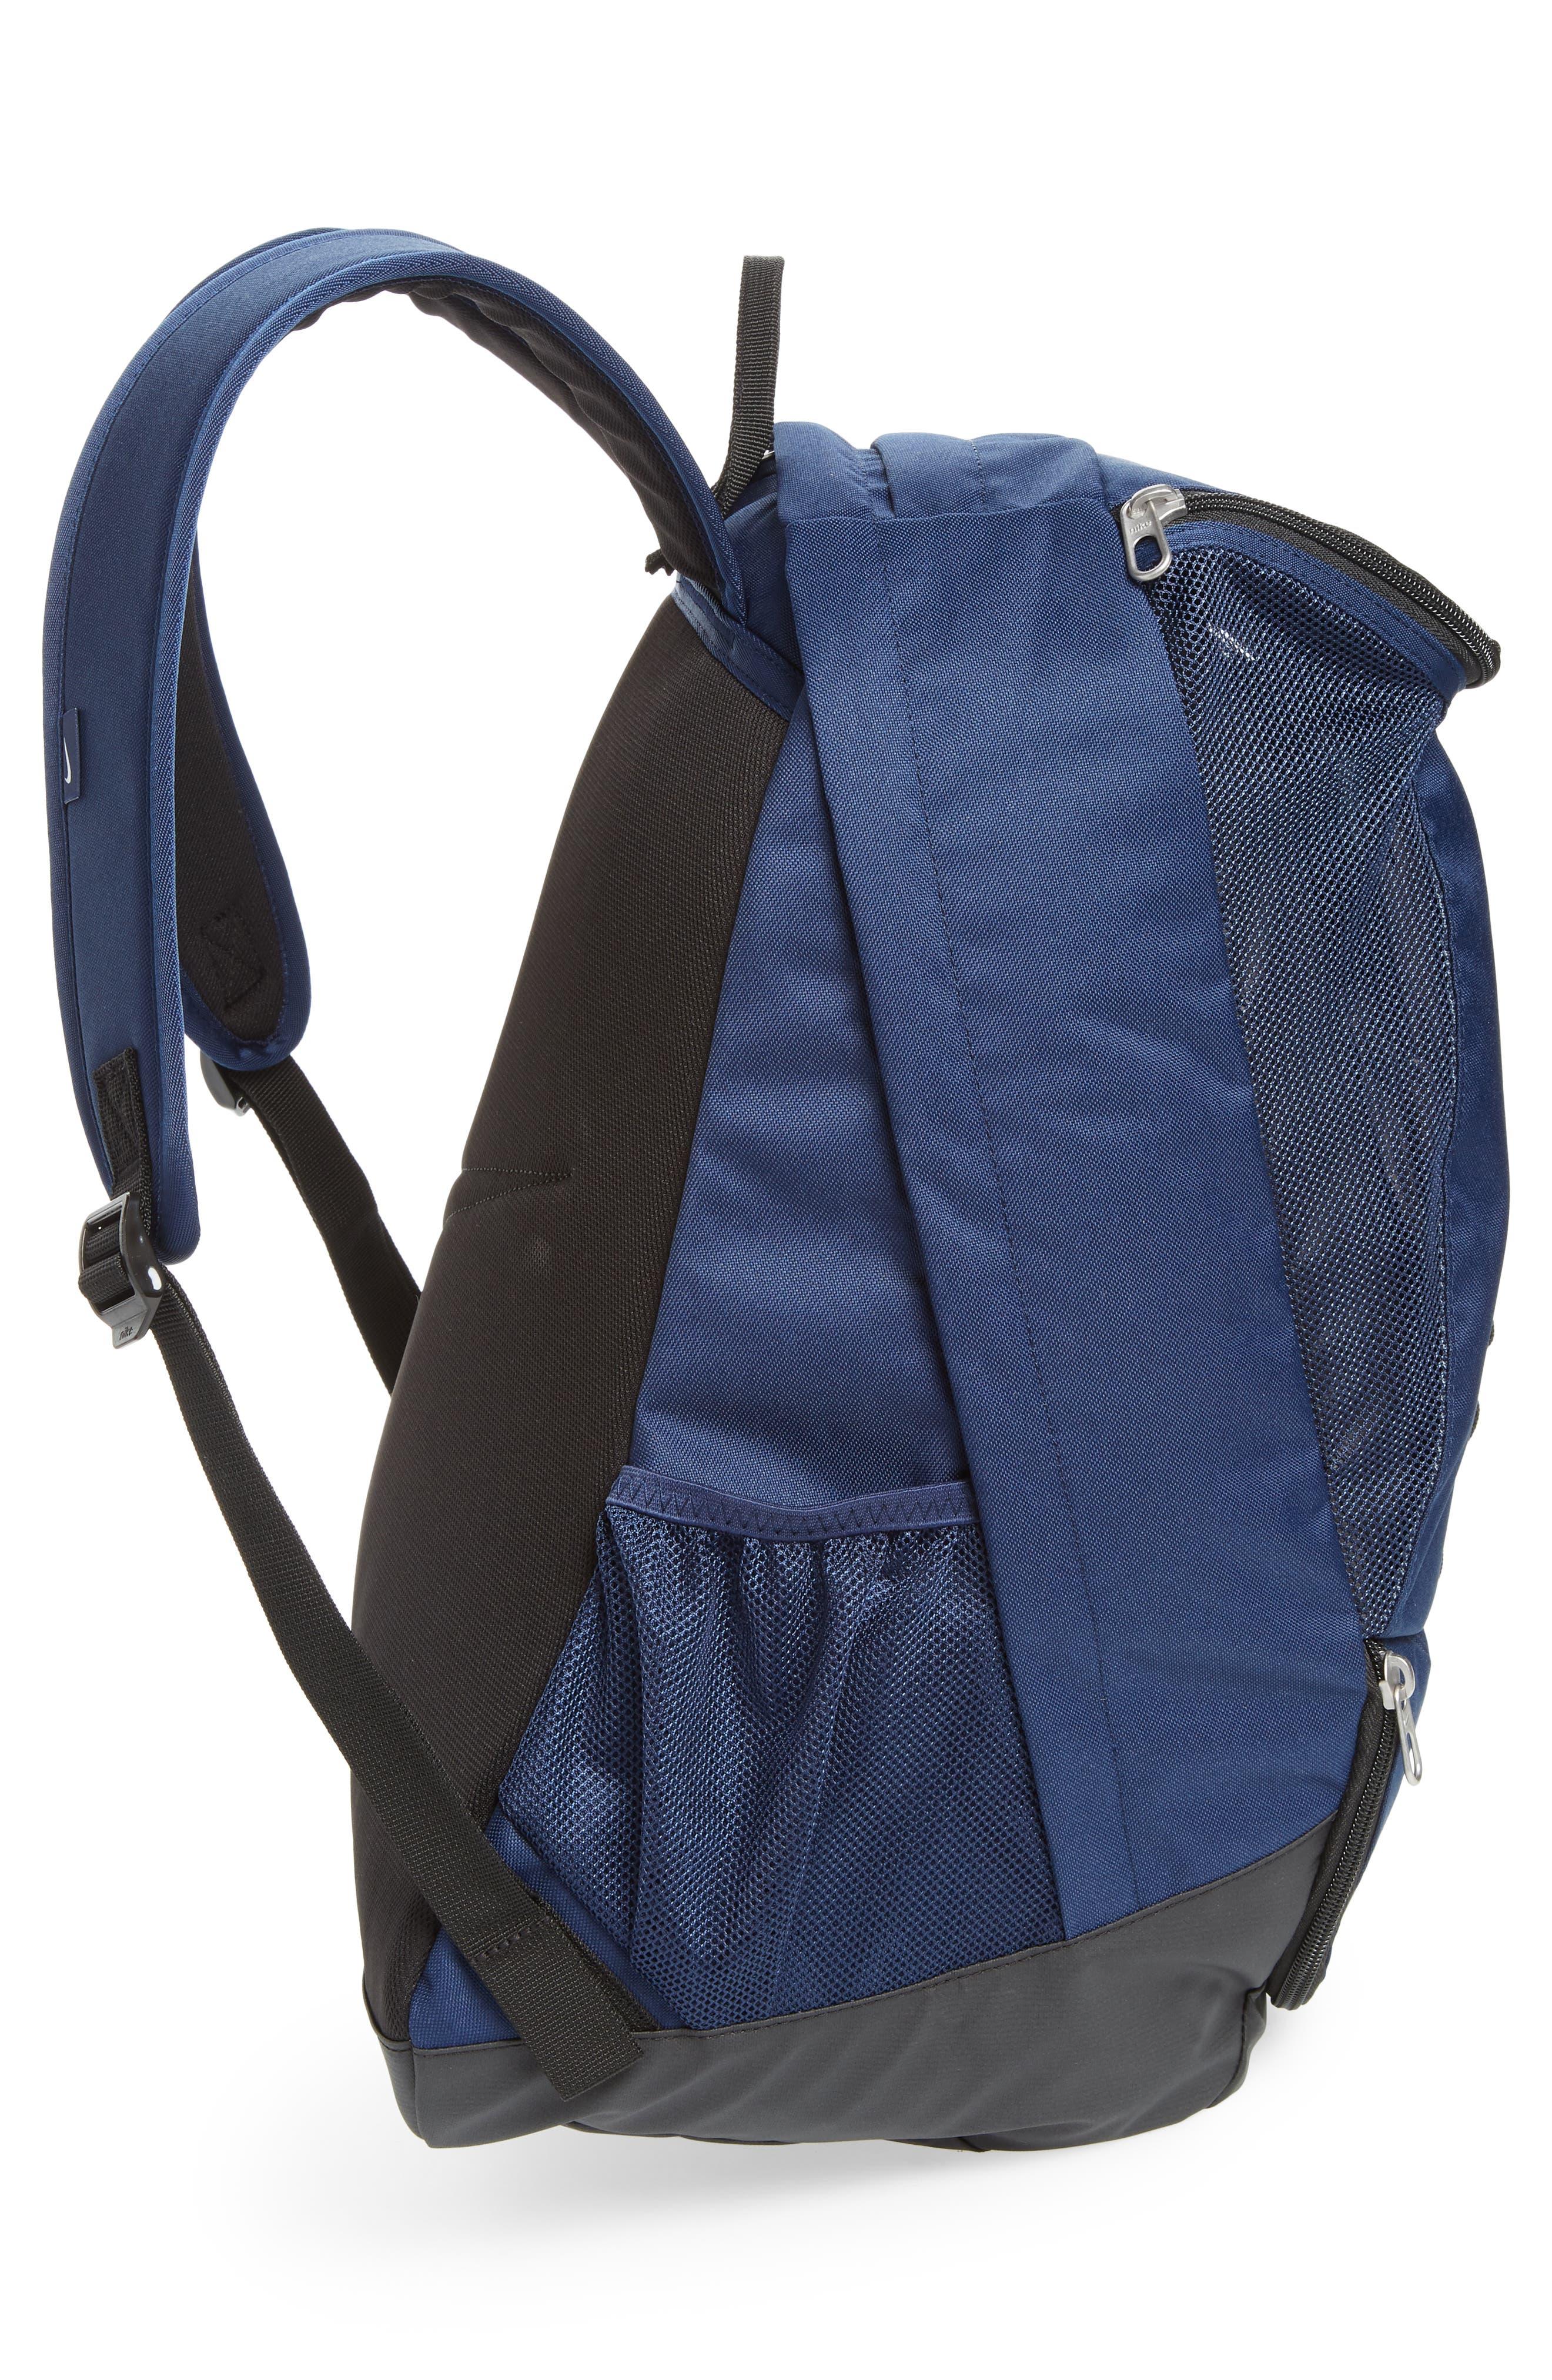 Club Team Backpack,                             Alternate thumbnail 4, color,                             Midnight Navy/ Black/ White